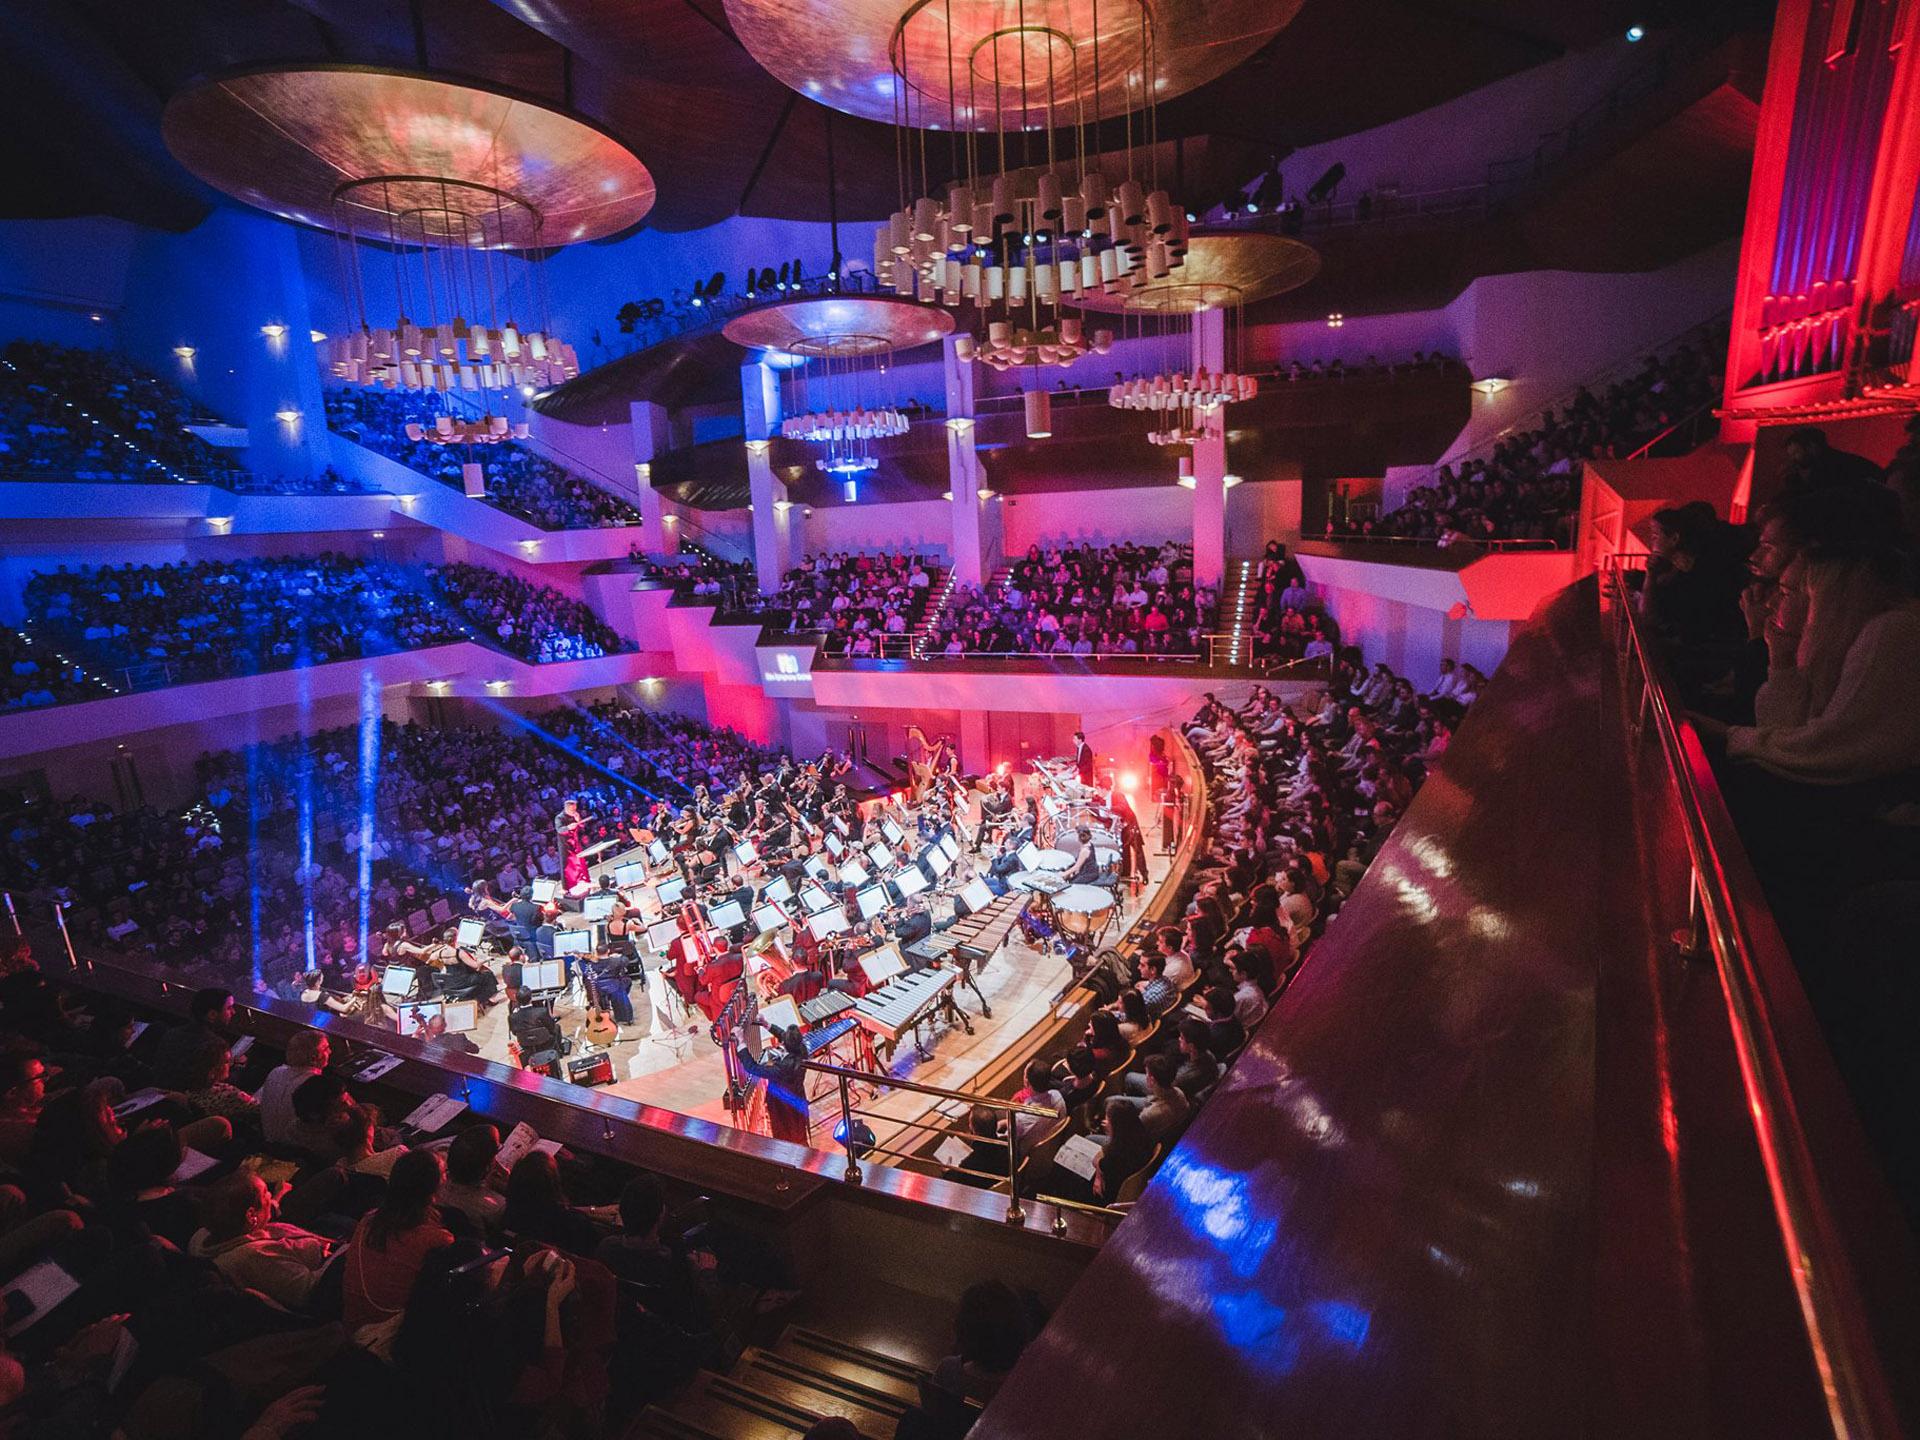 La Film Symphony Orchestra rinde homenaje a John Williams